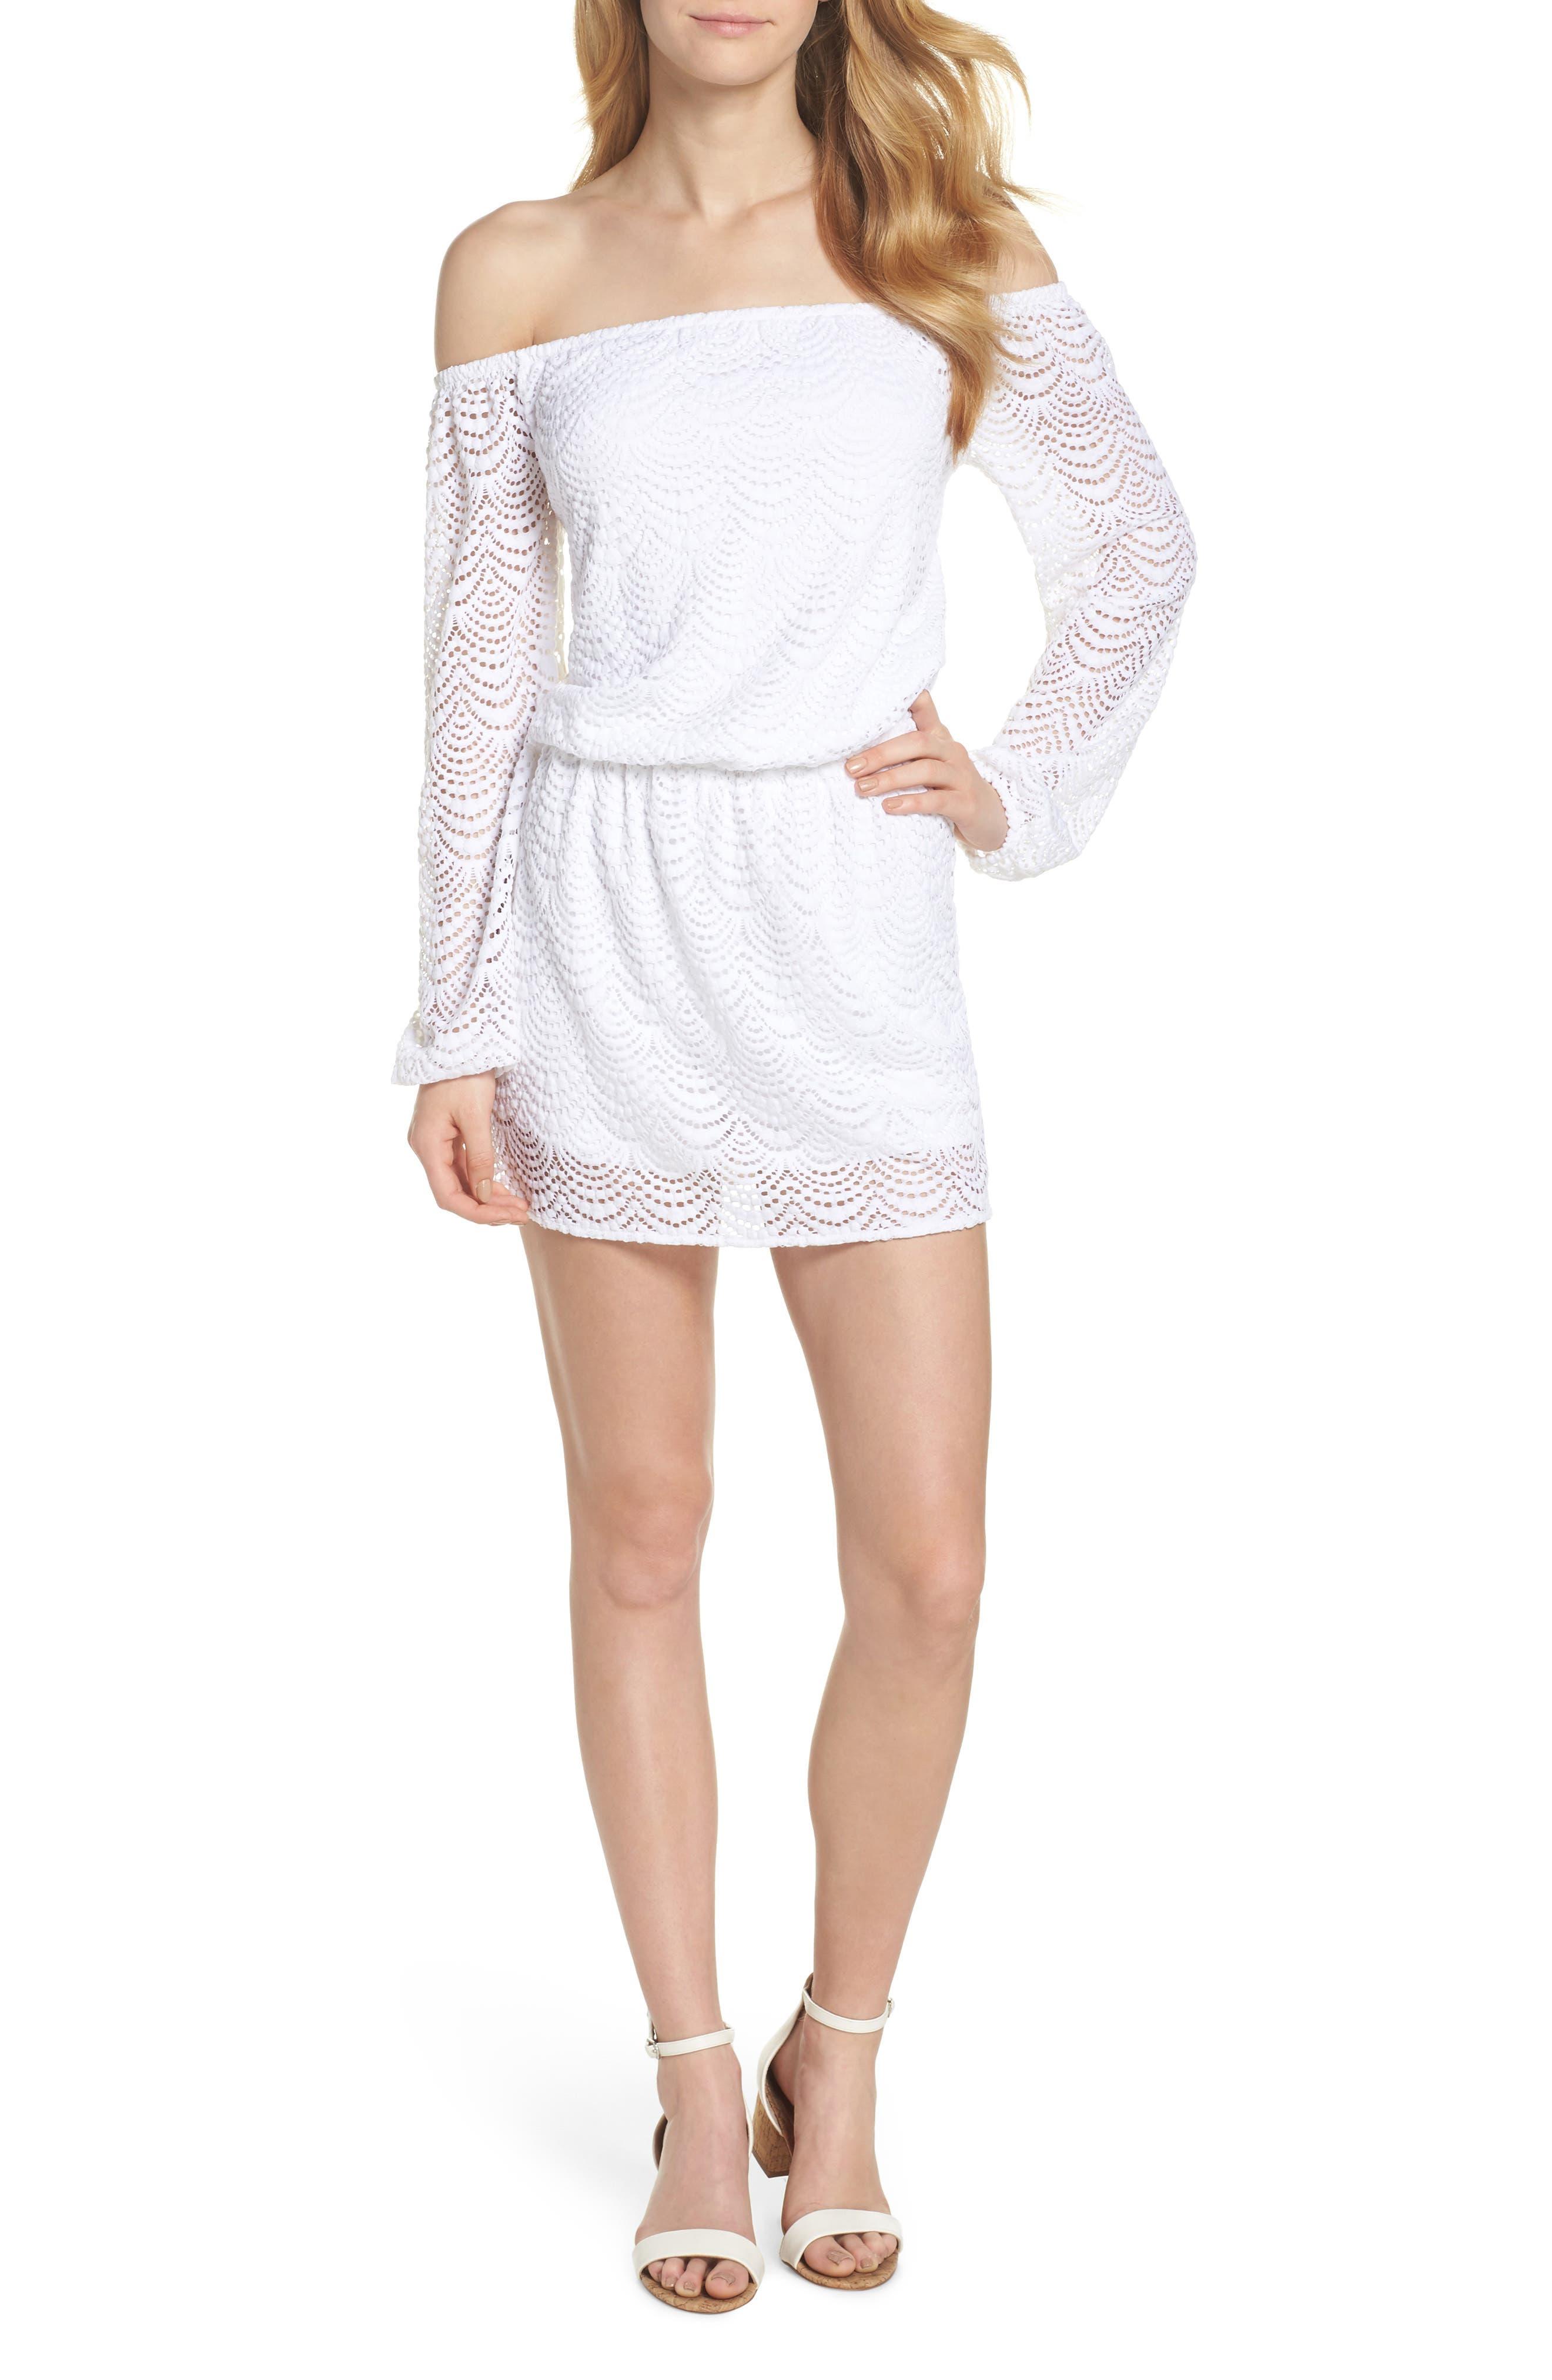 Lana Off the Shoulder Romper,                         Main,                         color, Resort White Scalloped Shell